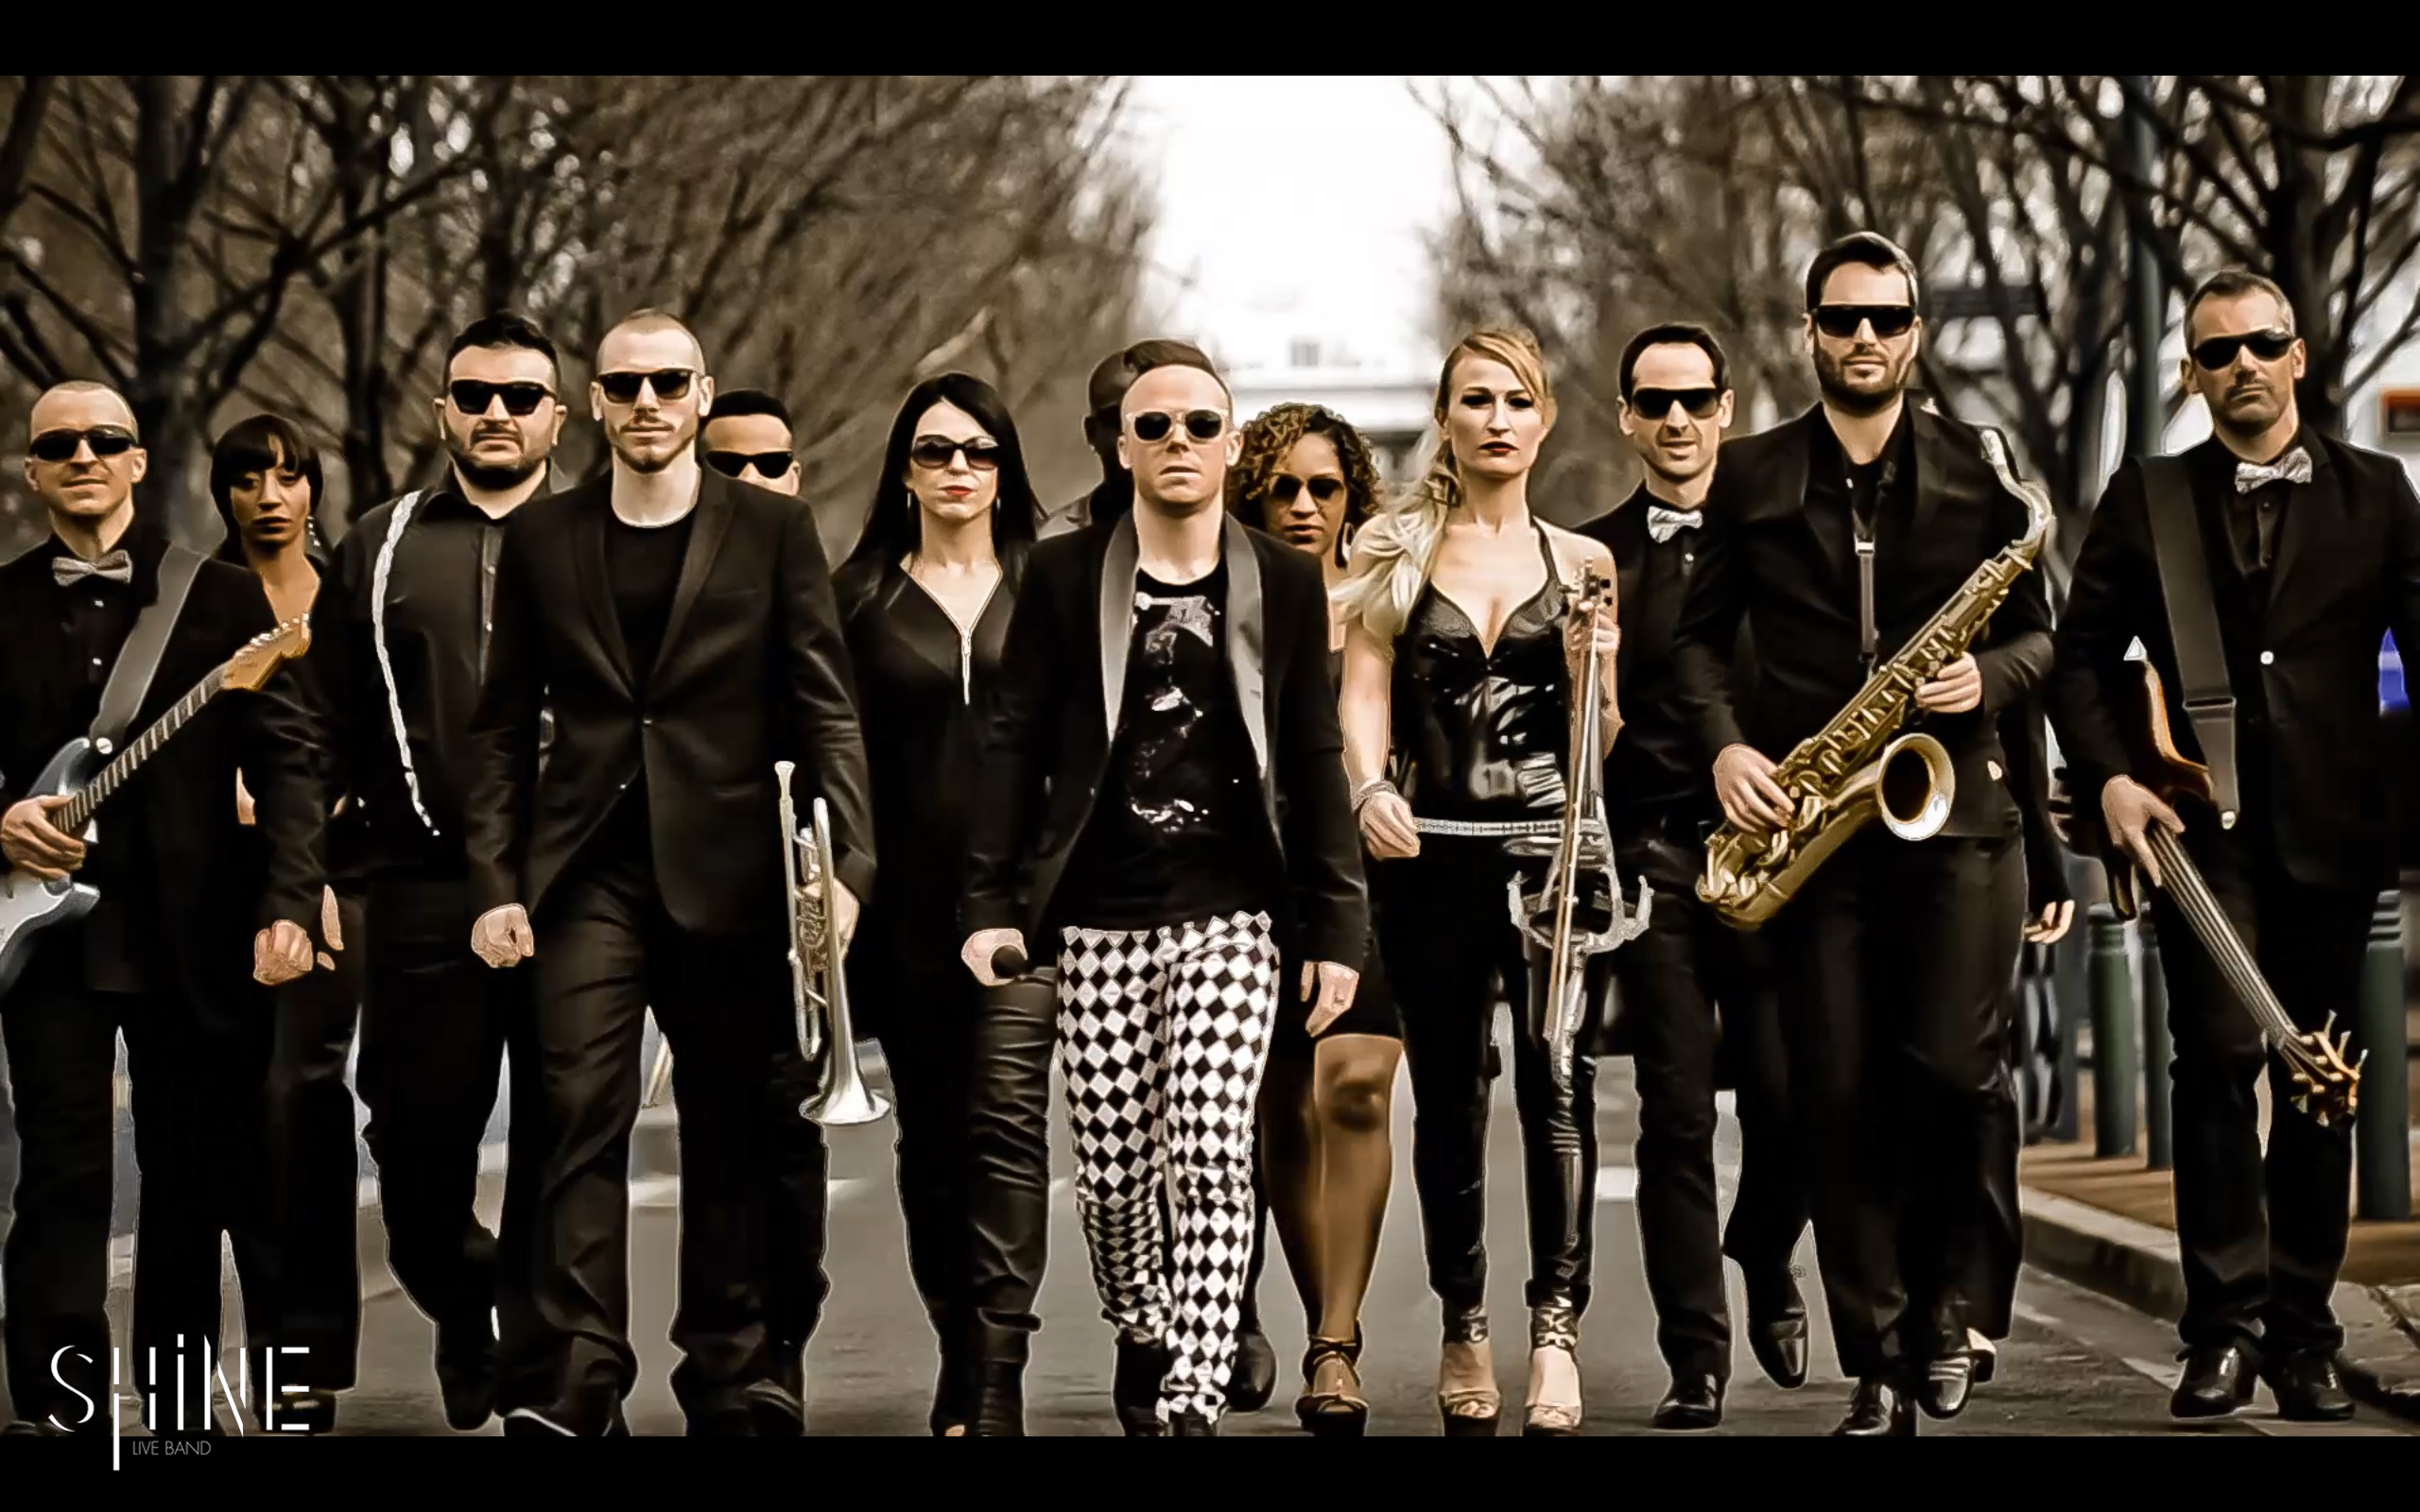 SHINE Live Band | Wedding Entertainment (Music) in Paris ...